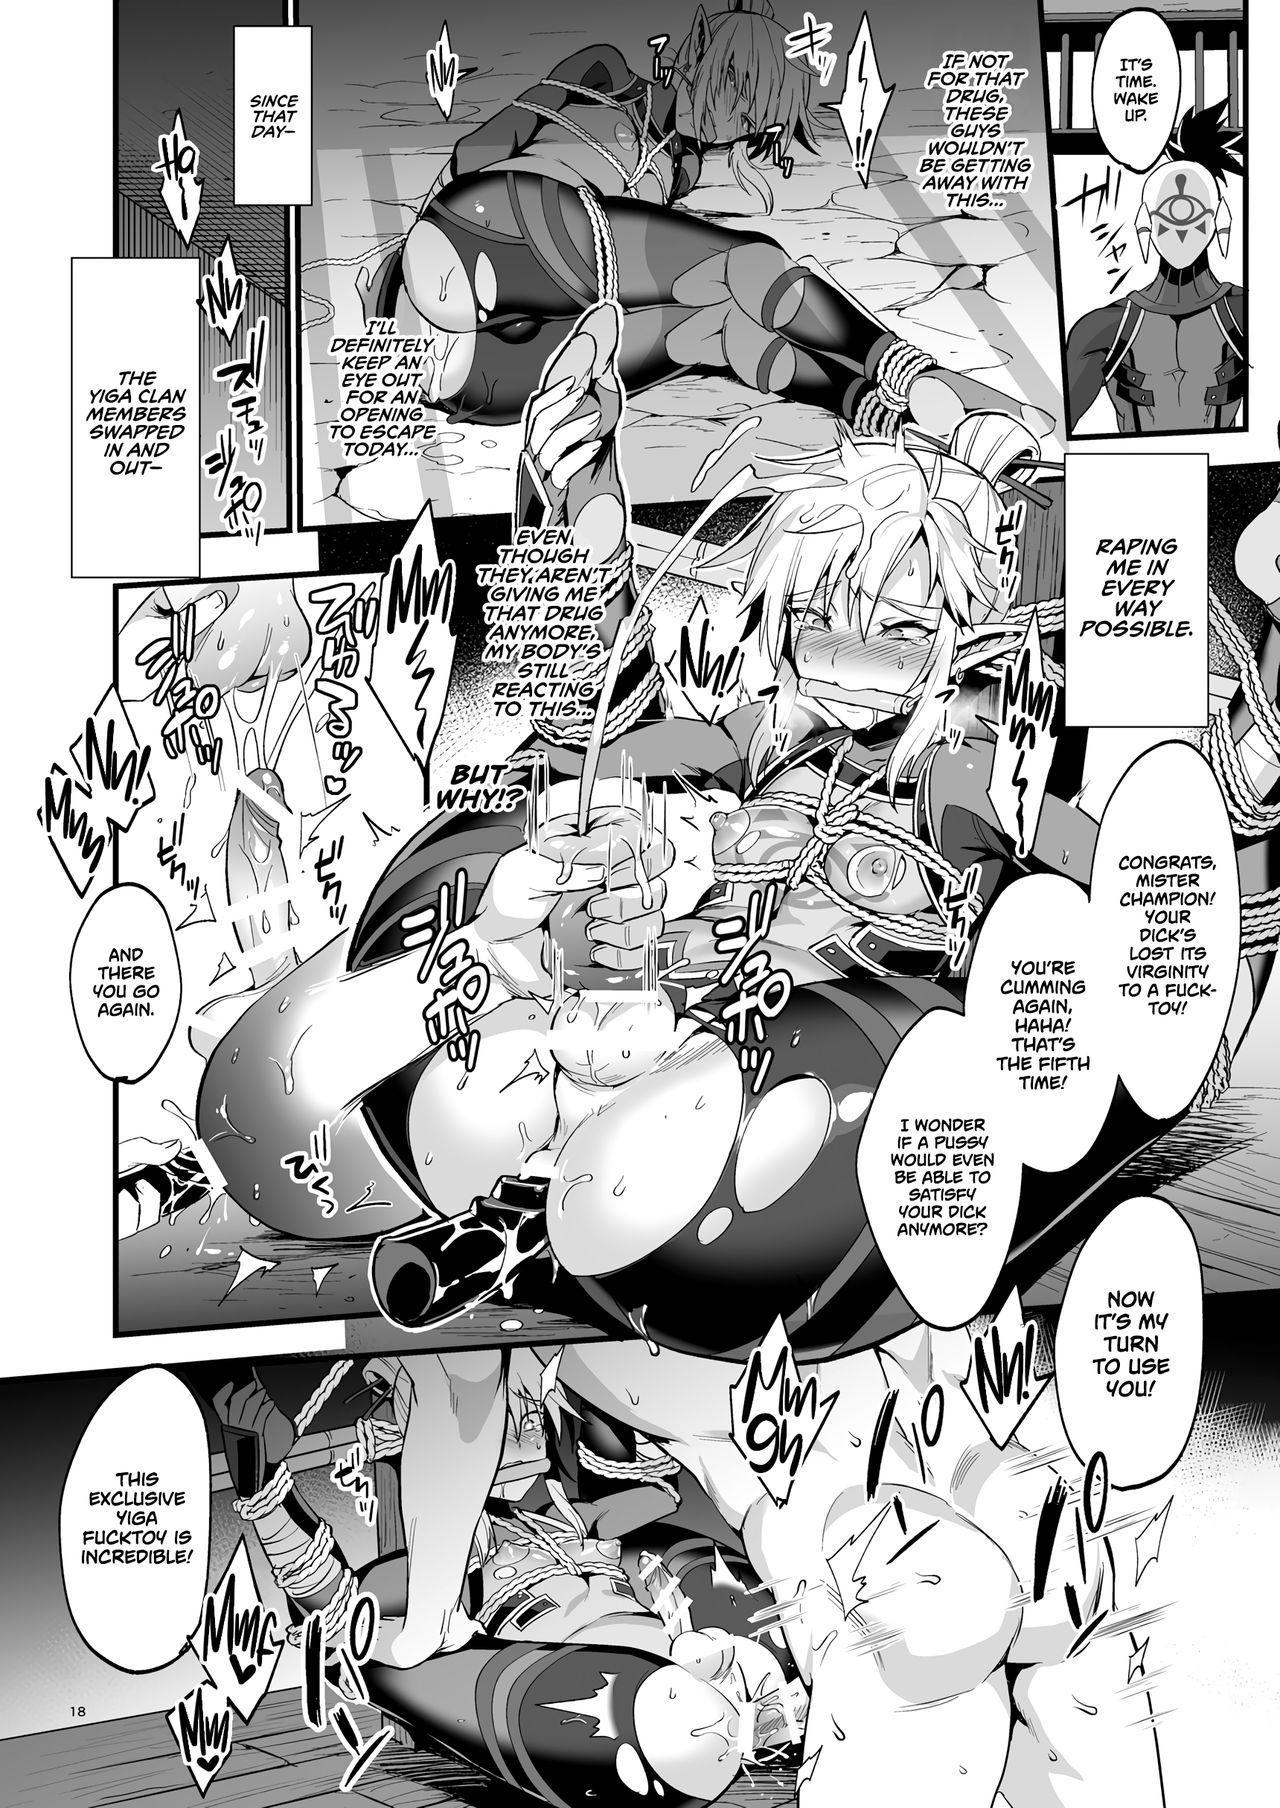 [Morittokoke (Morikoke)] Eiketsu Ninja Gaiden ~Haiboku Hen~ | The Champion's Ninja Side Story ~Failure~ (The Legend of Zelda) [English] =TLL + mrwayne= [Digital] 15